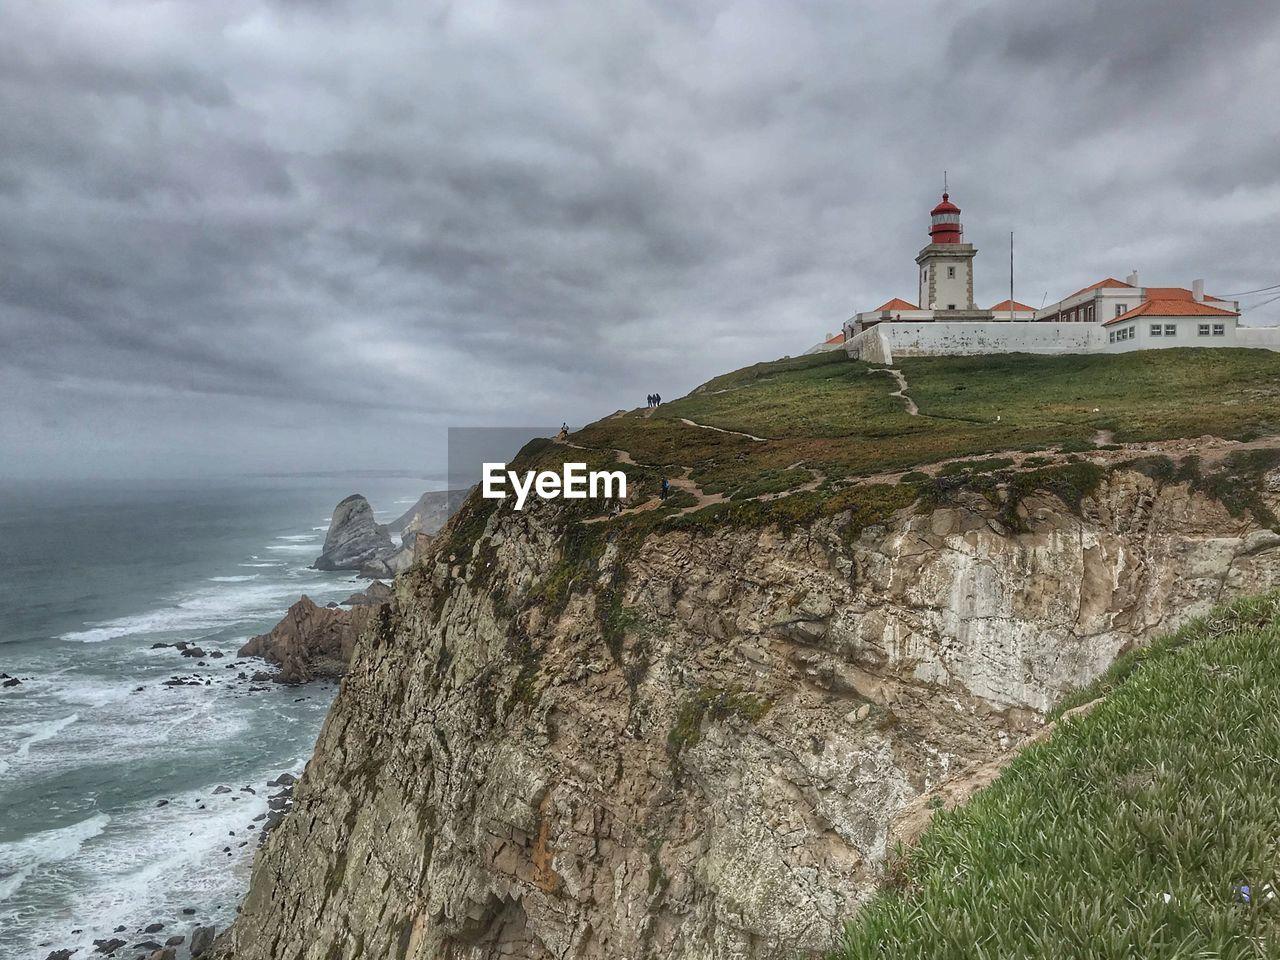 Lighthouse On Mountain By Sea Against Cloudy Sky